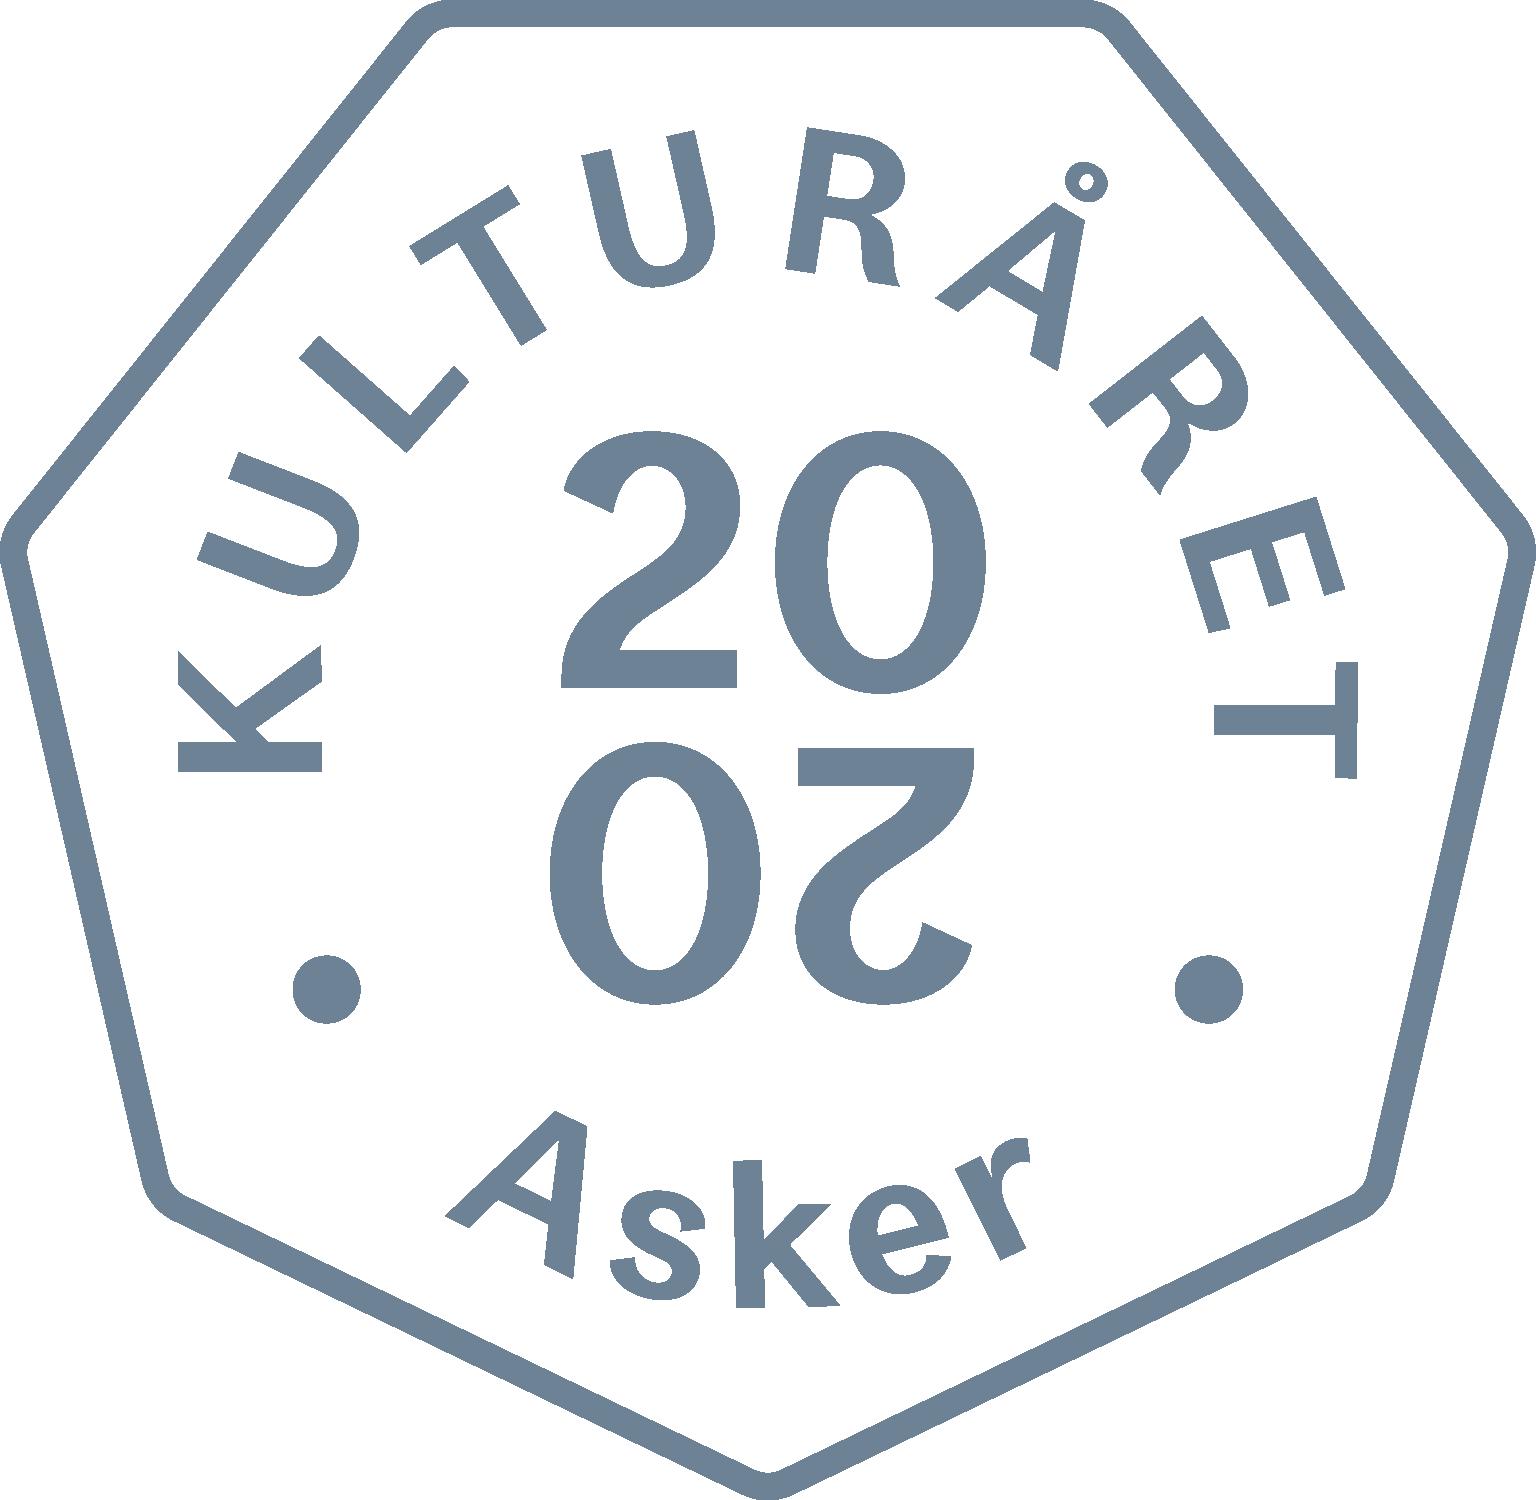 Asker_Kulturåret2020_logo-omriss_grå_RGB